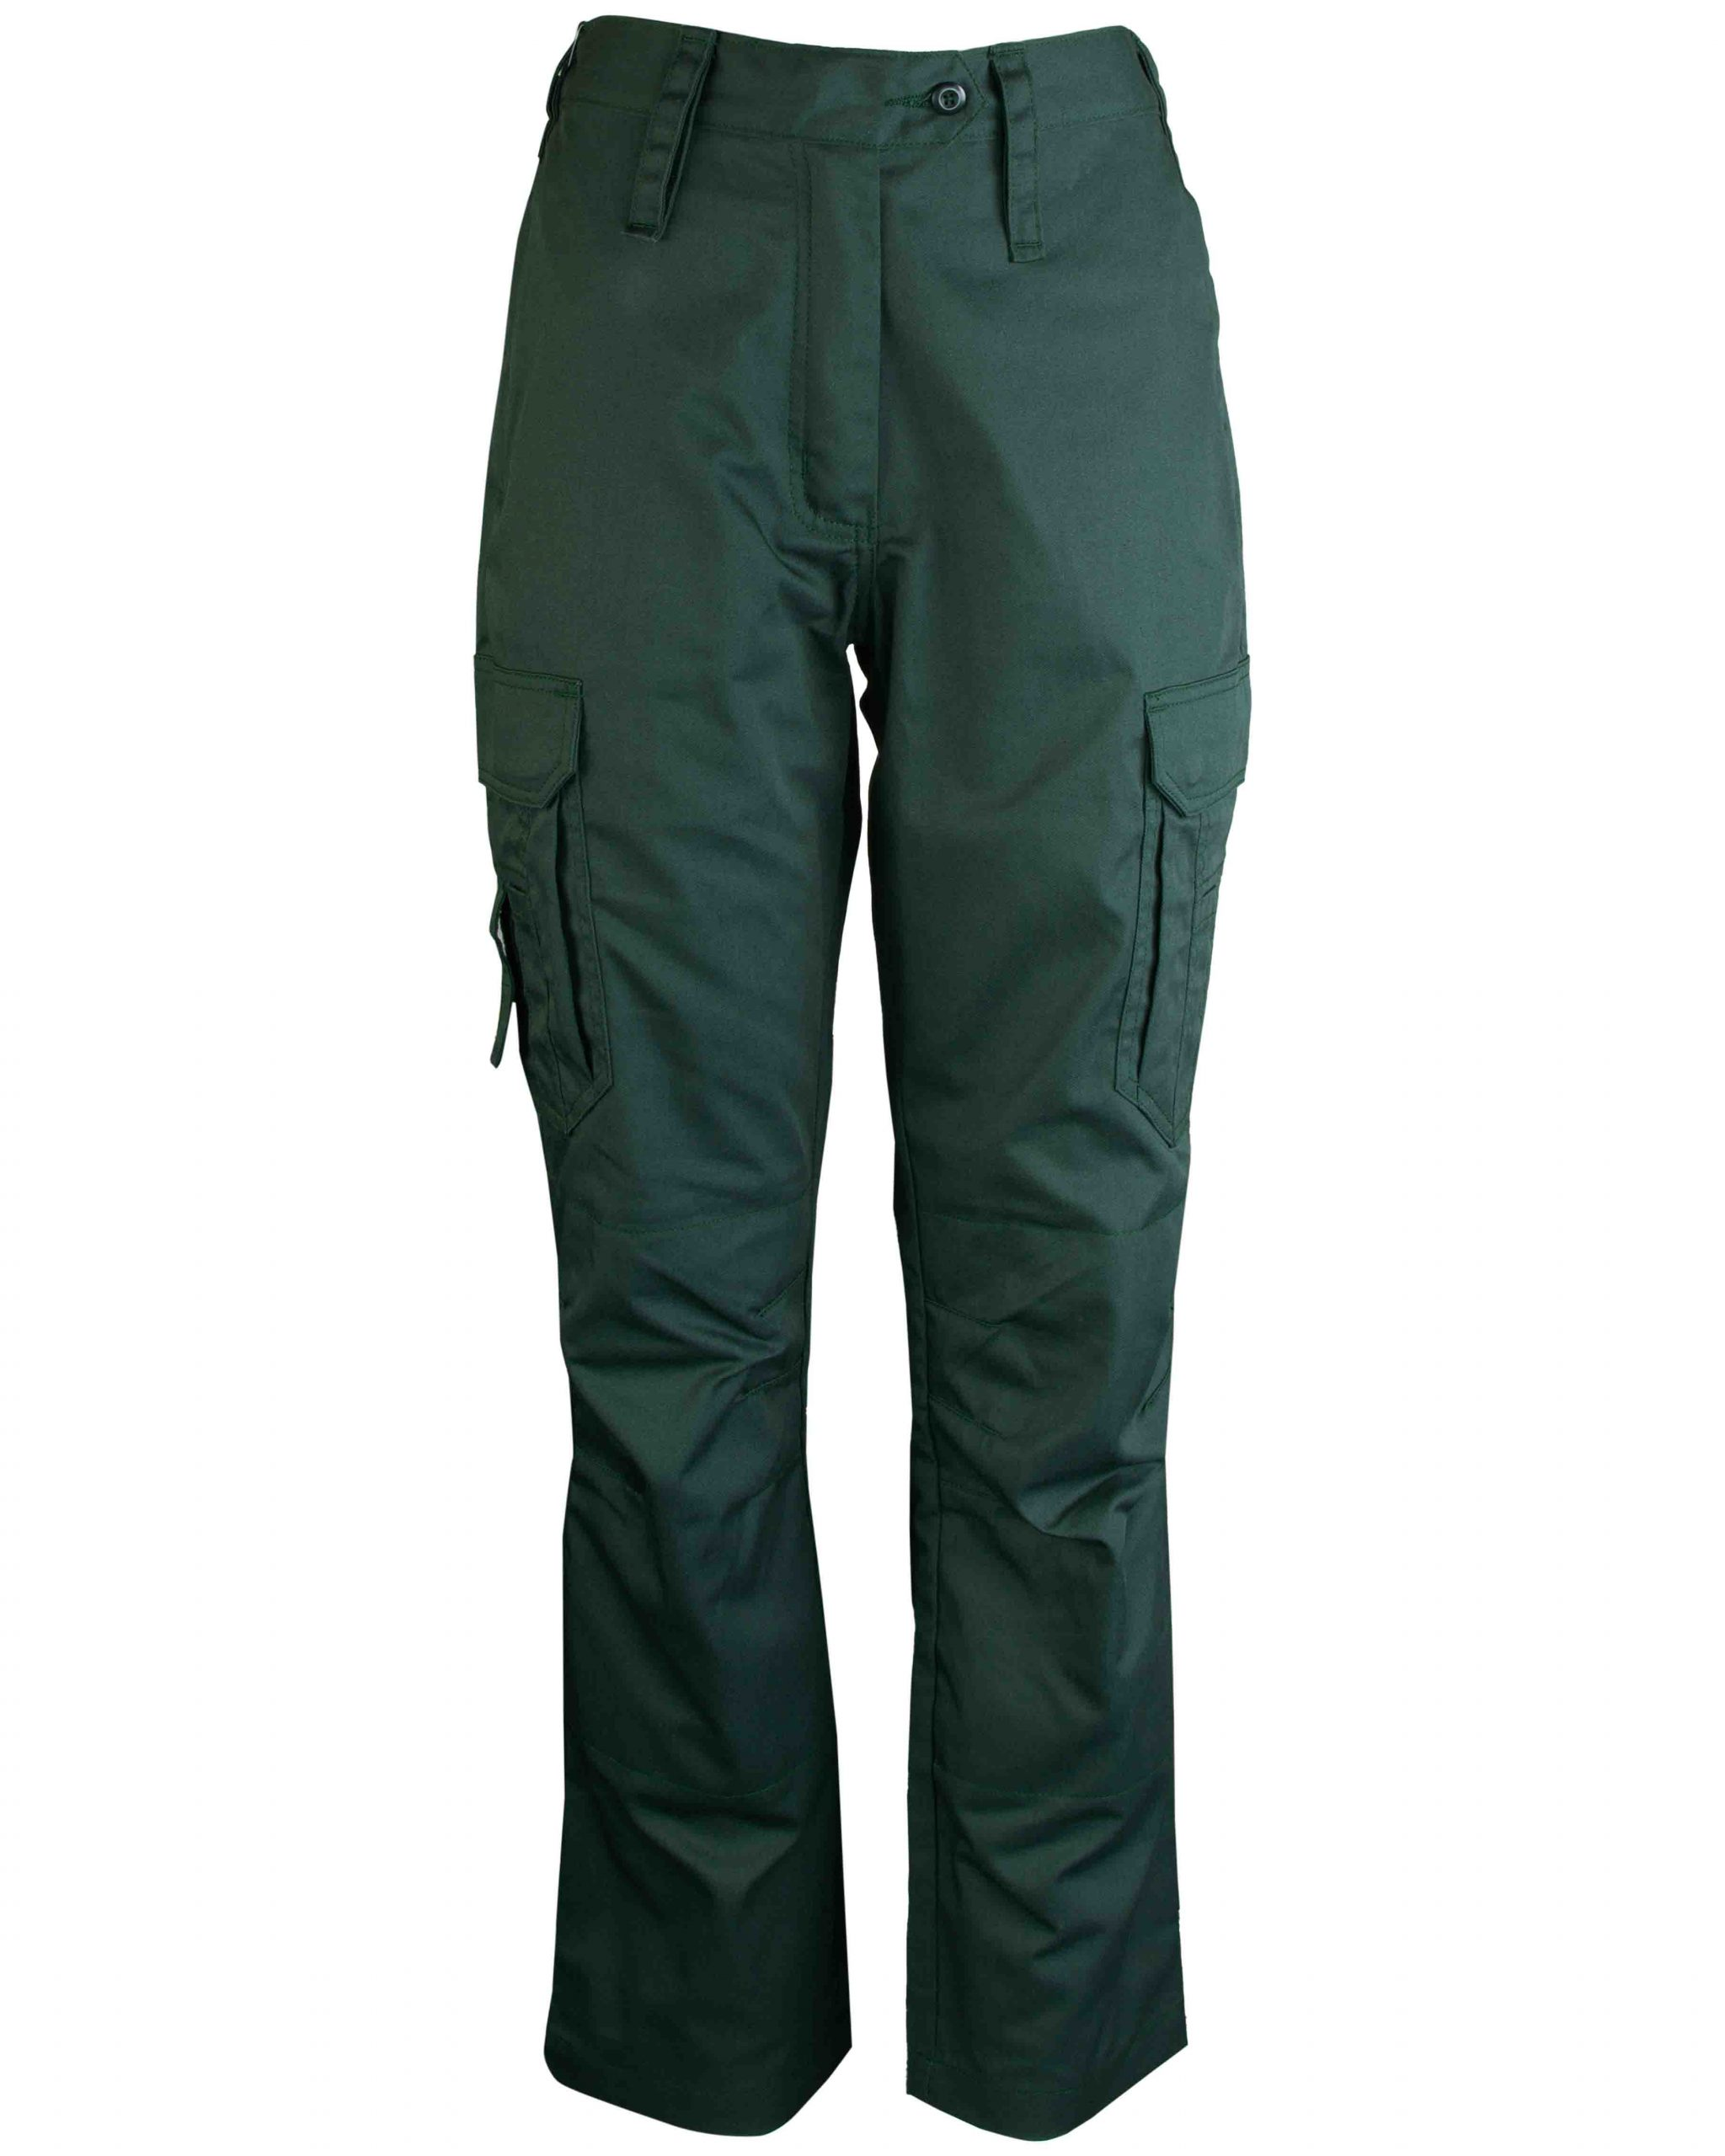 Ambulance Trousers – Ladies